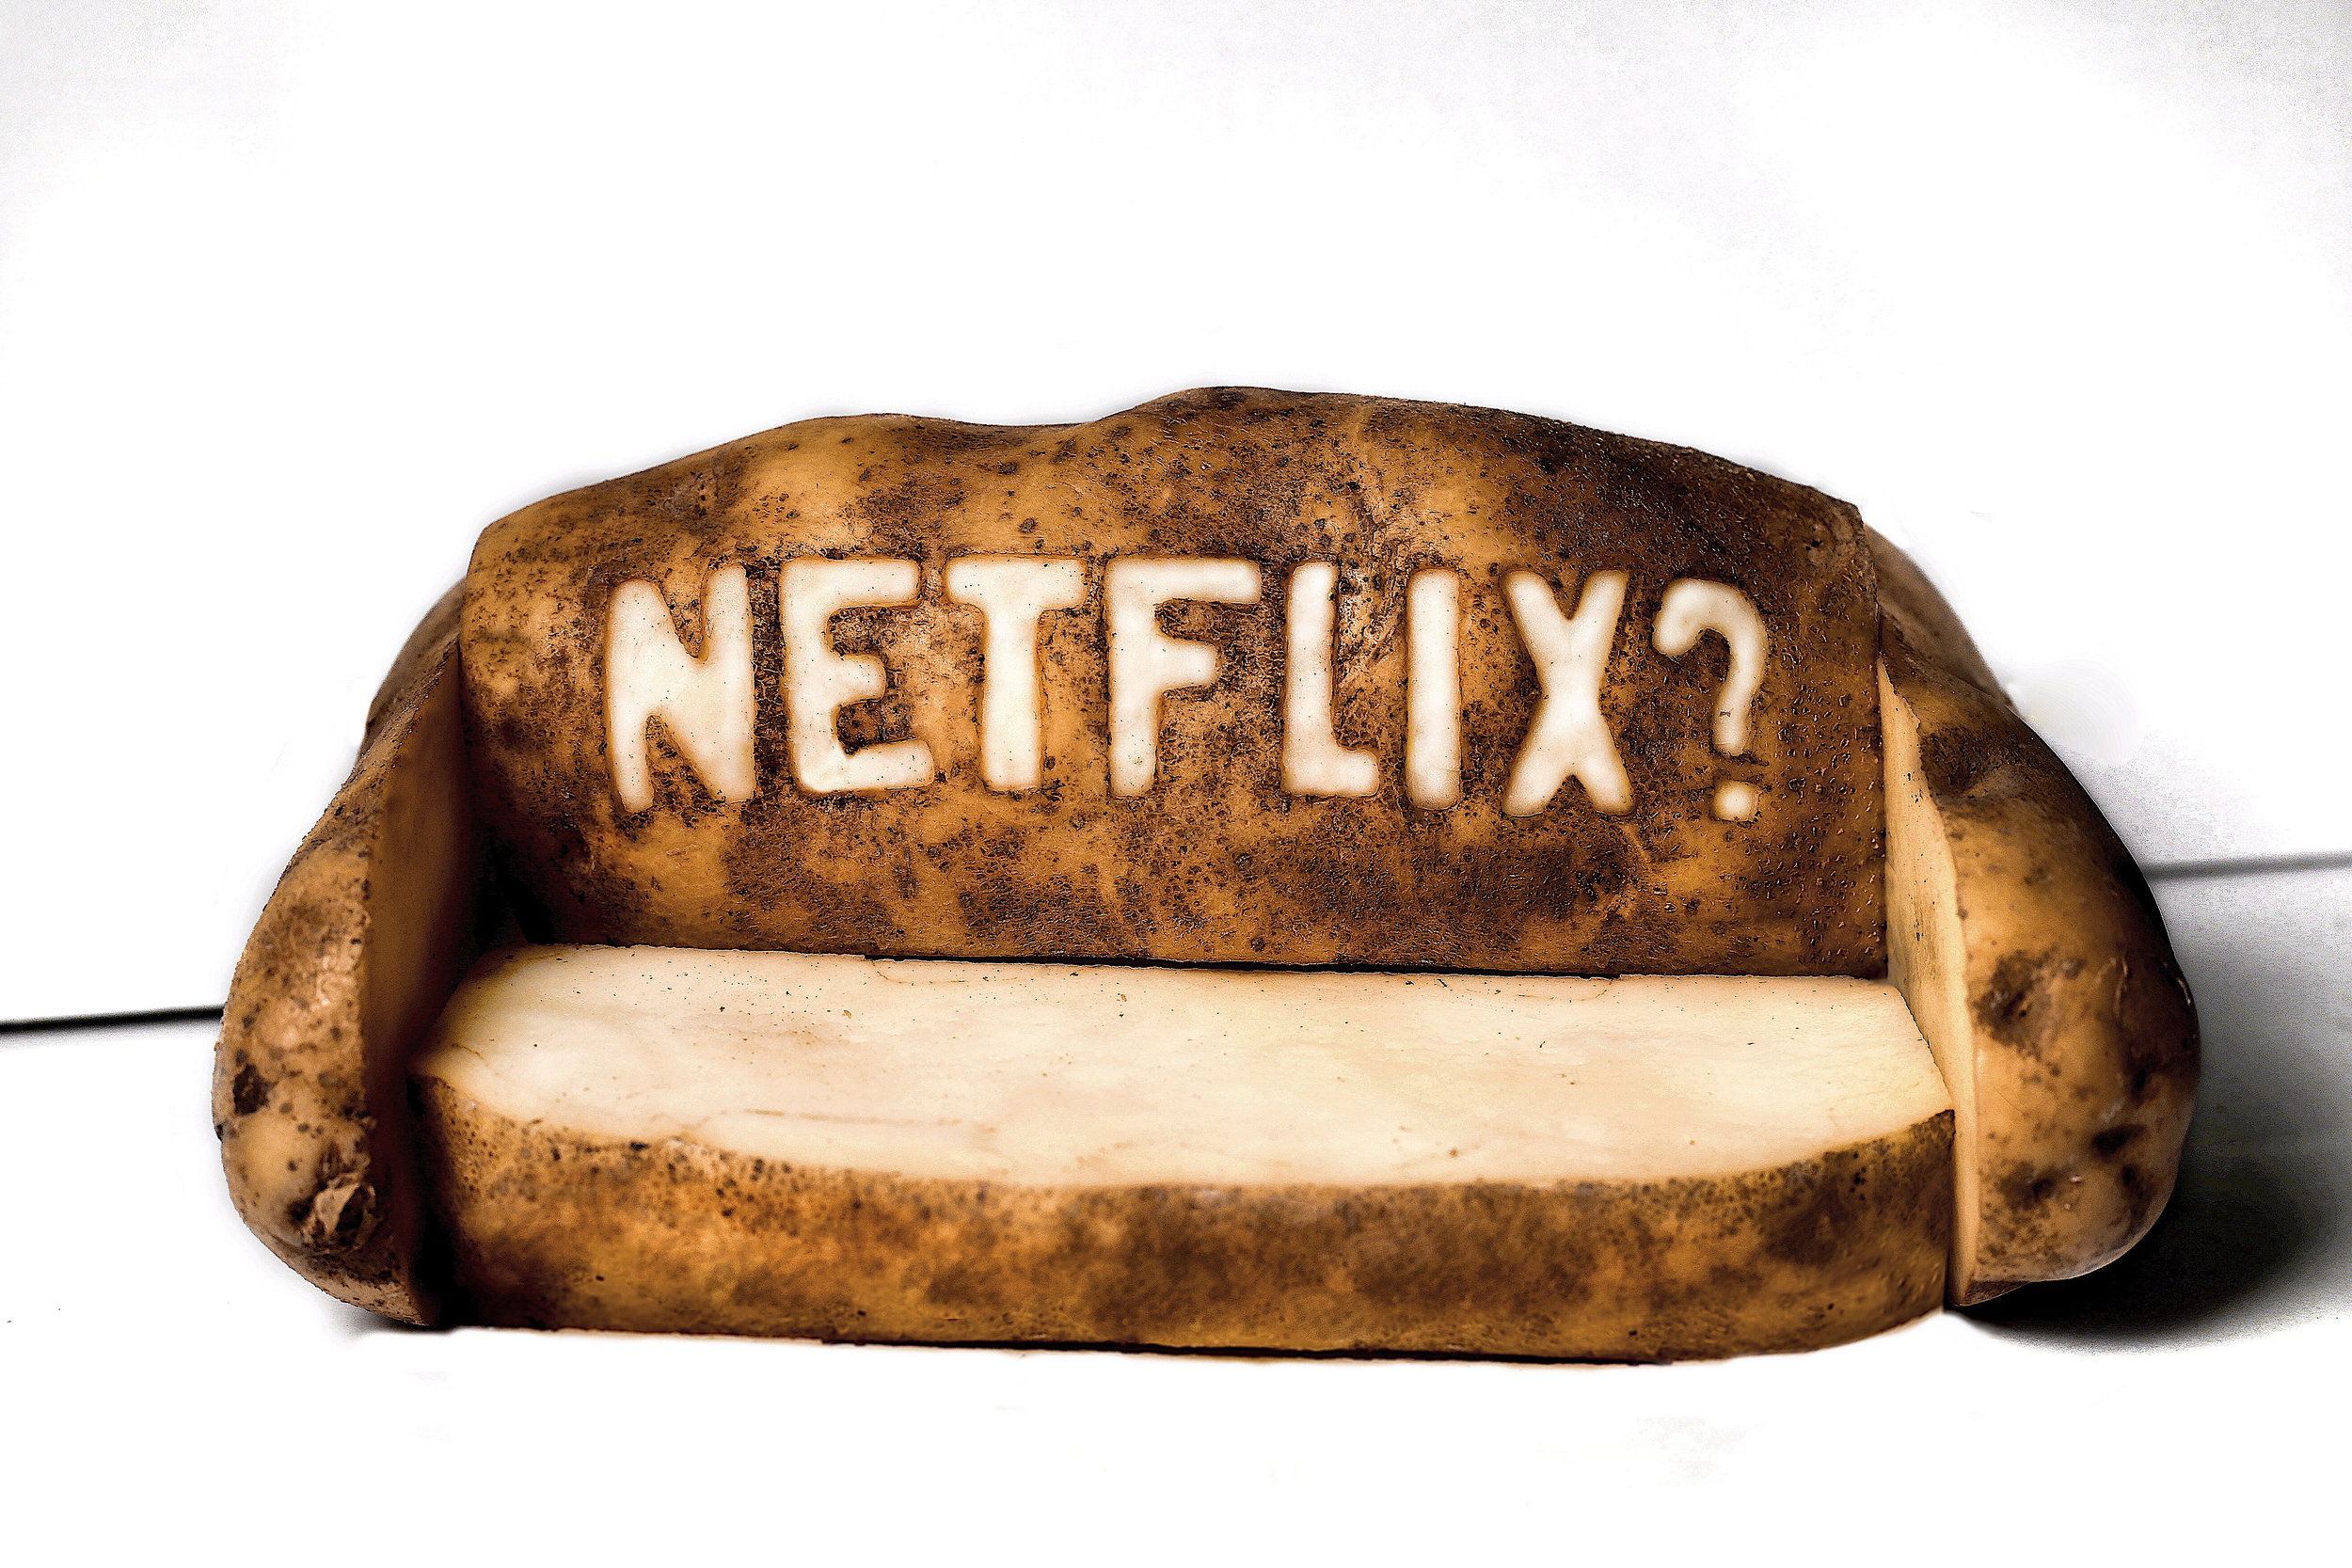 Couch Potato  Russet Potatoes